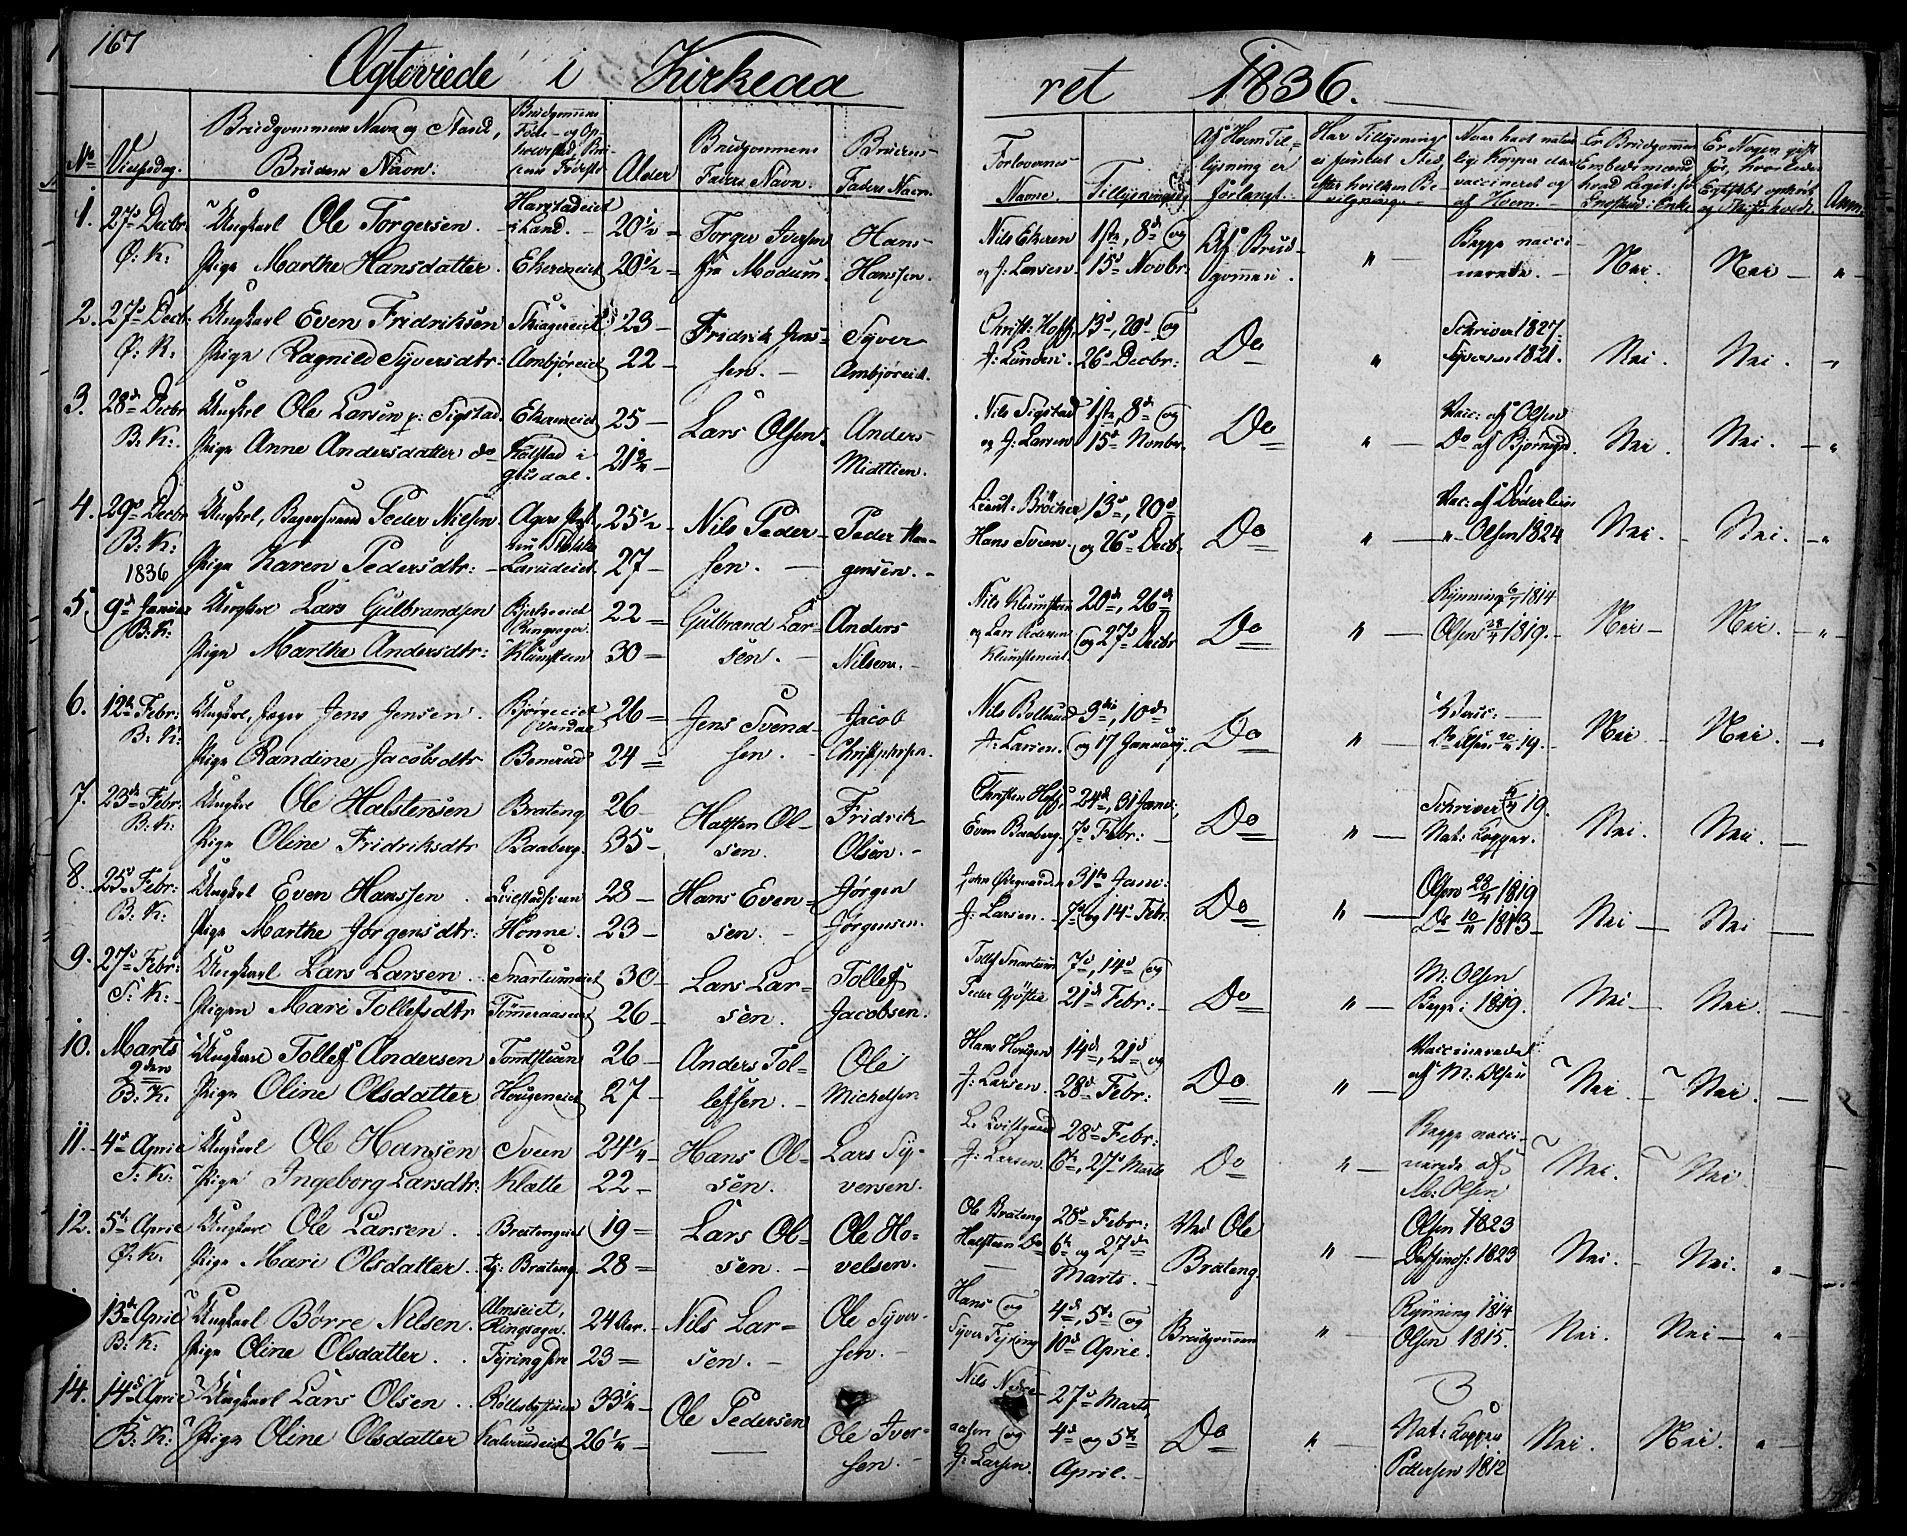 SAH, Biri prestekontor, Ministerialbok nr. 4, 1829-1842, s. 167